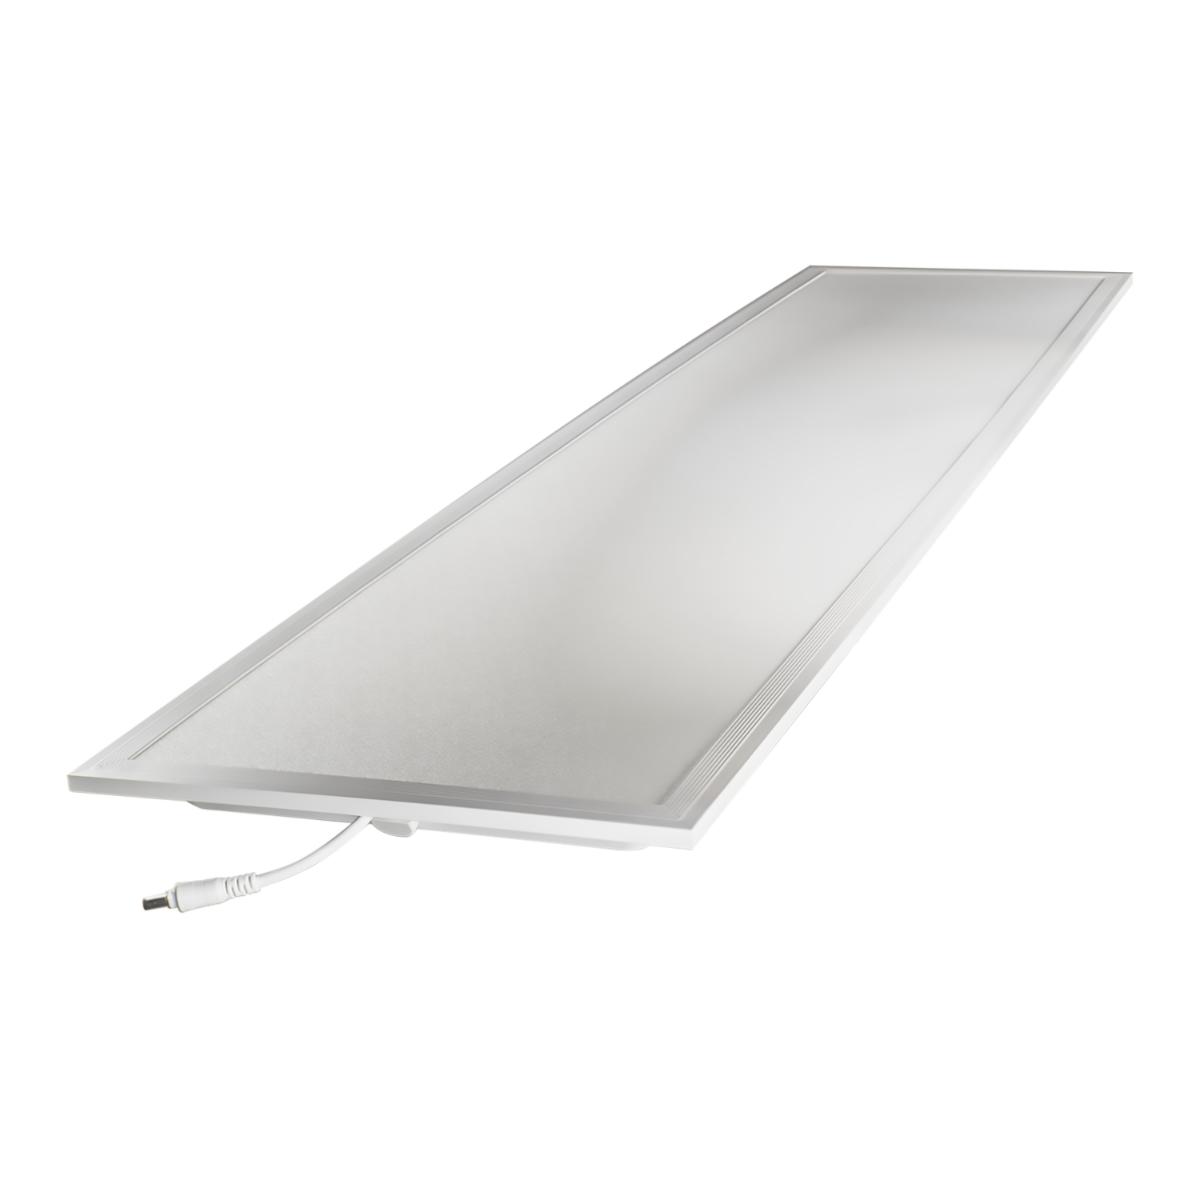 Noxion Panel LED Delta Pro V2.0 Xitanium DALI 30W 30x120cm 3000K 3960lm UGR <19   Dali Regulable - Luz Cálida - Reemplazo 2x36W